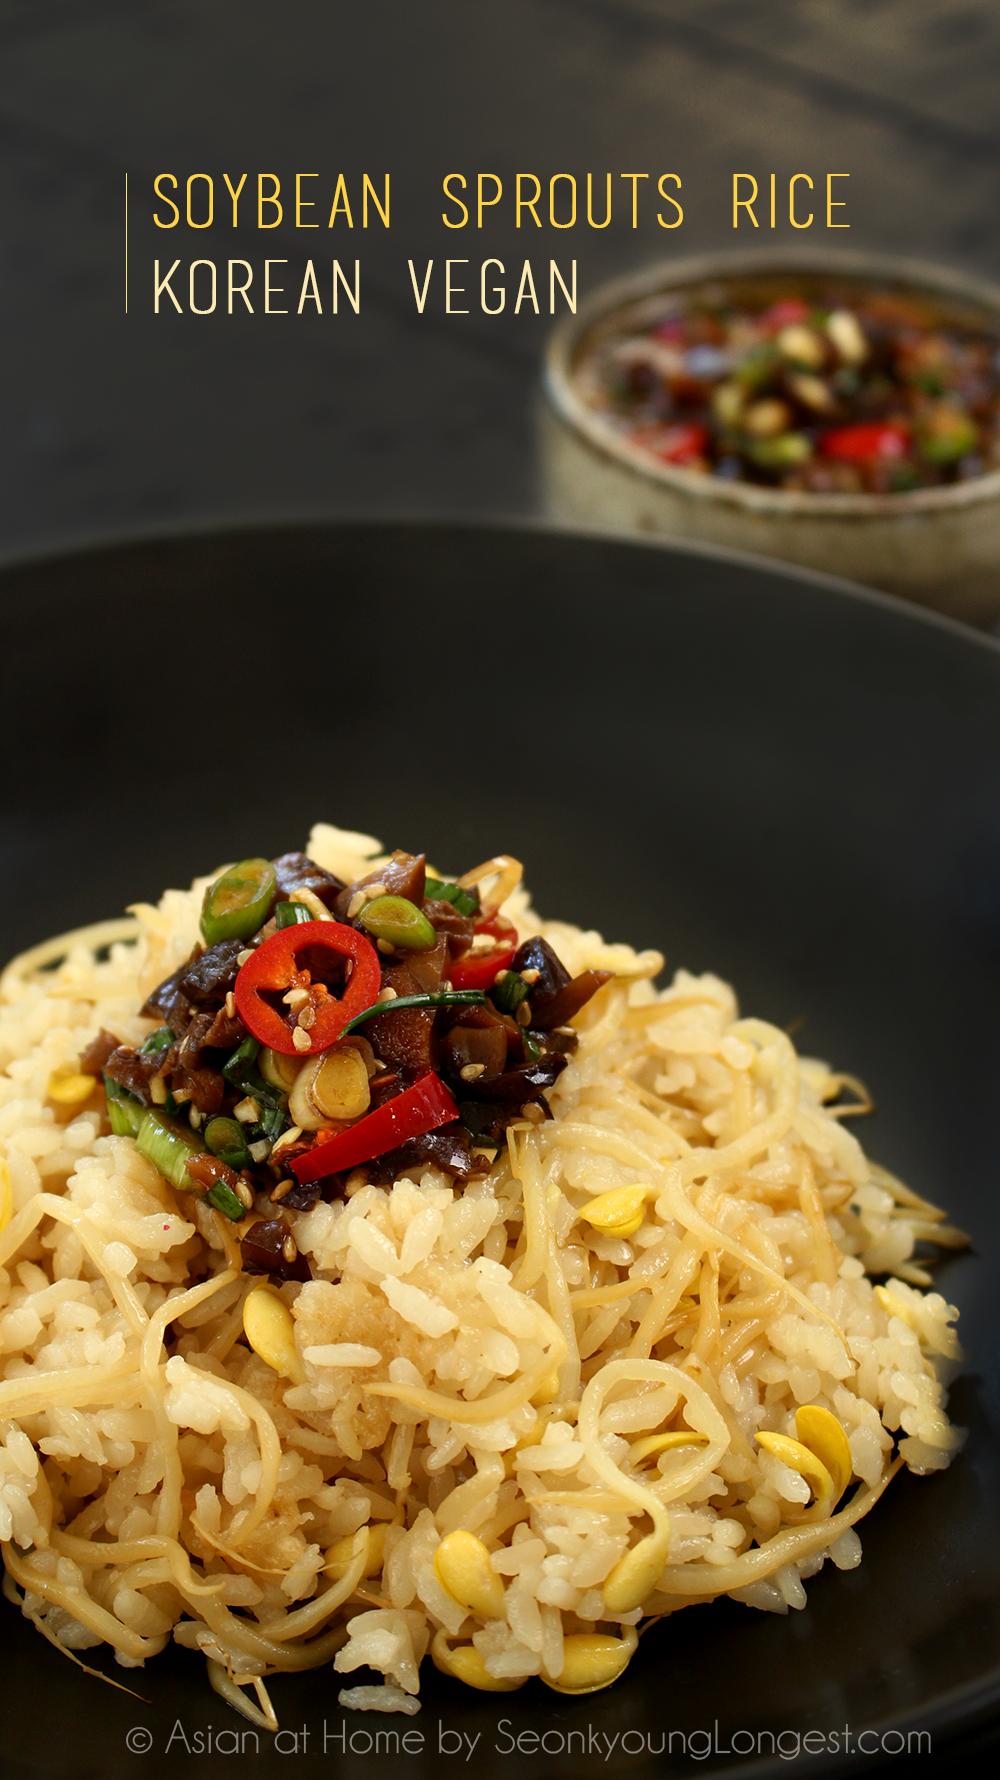 Korean vegan soybean sprouts rice recipe rice recipes sprouts food korean vegan soybean sprouts rice recipe forumfinder Gallery